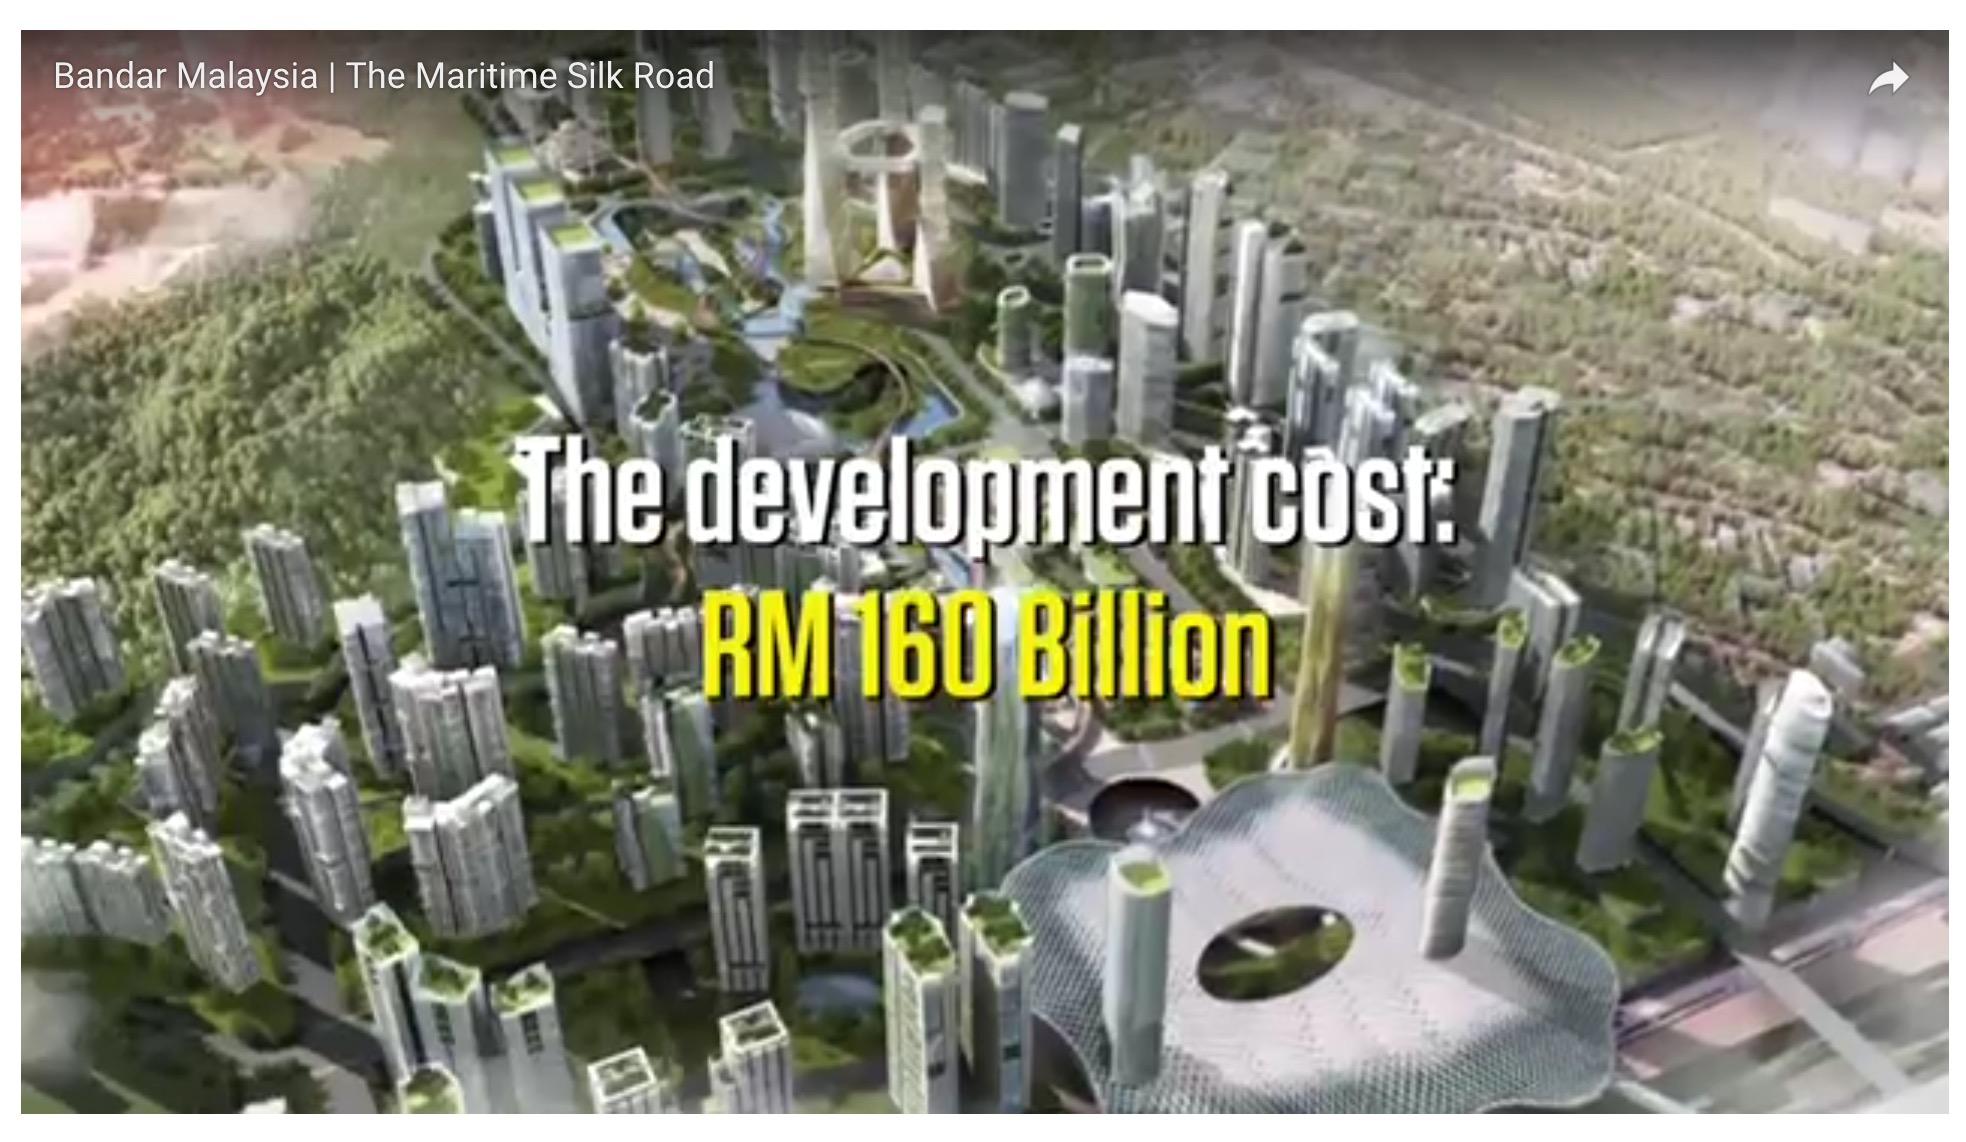 Bandar malaysia KL TERMINAL HIGH SPEED RIAL malaysia china Midfields 2